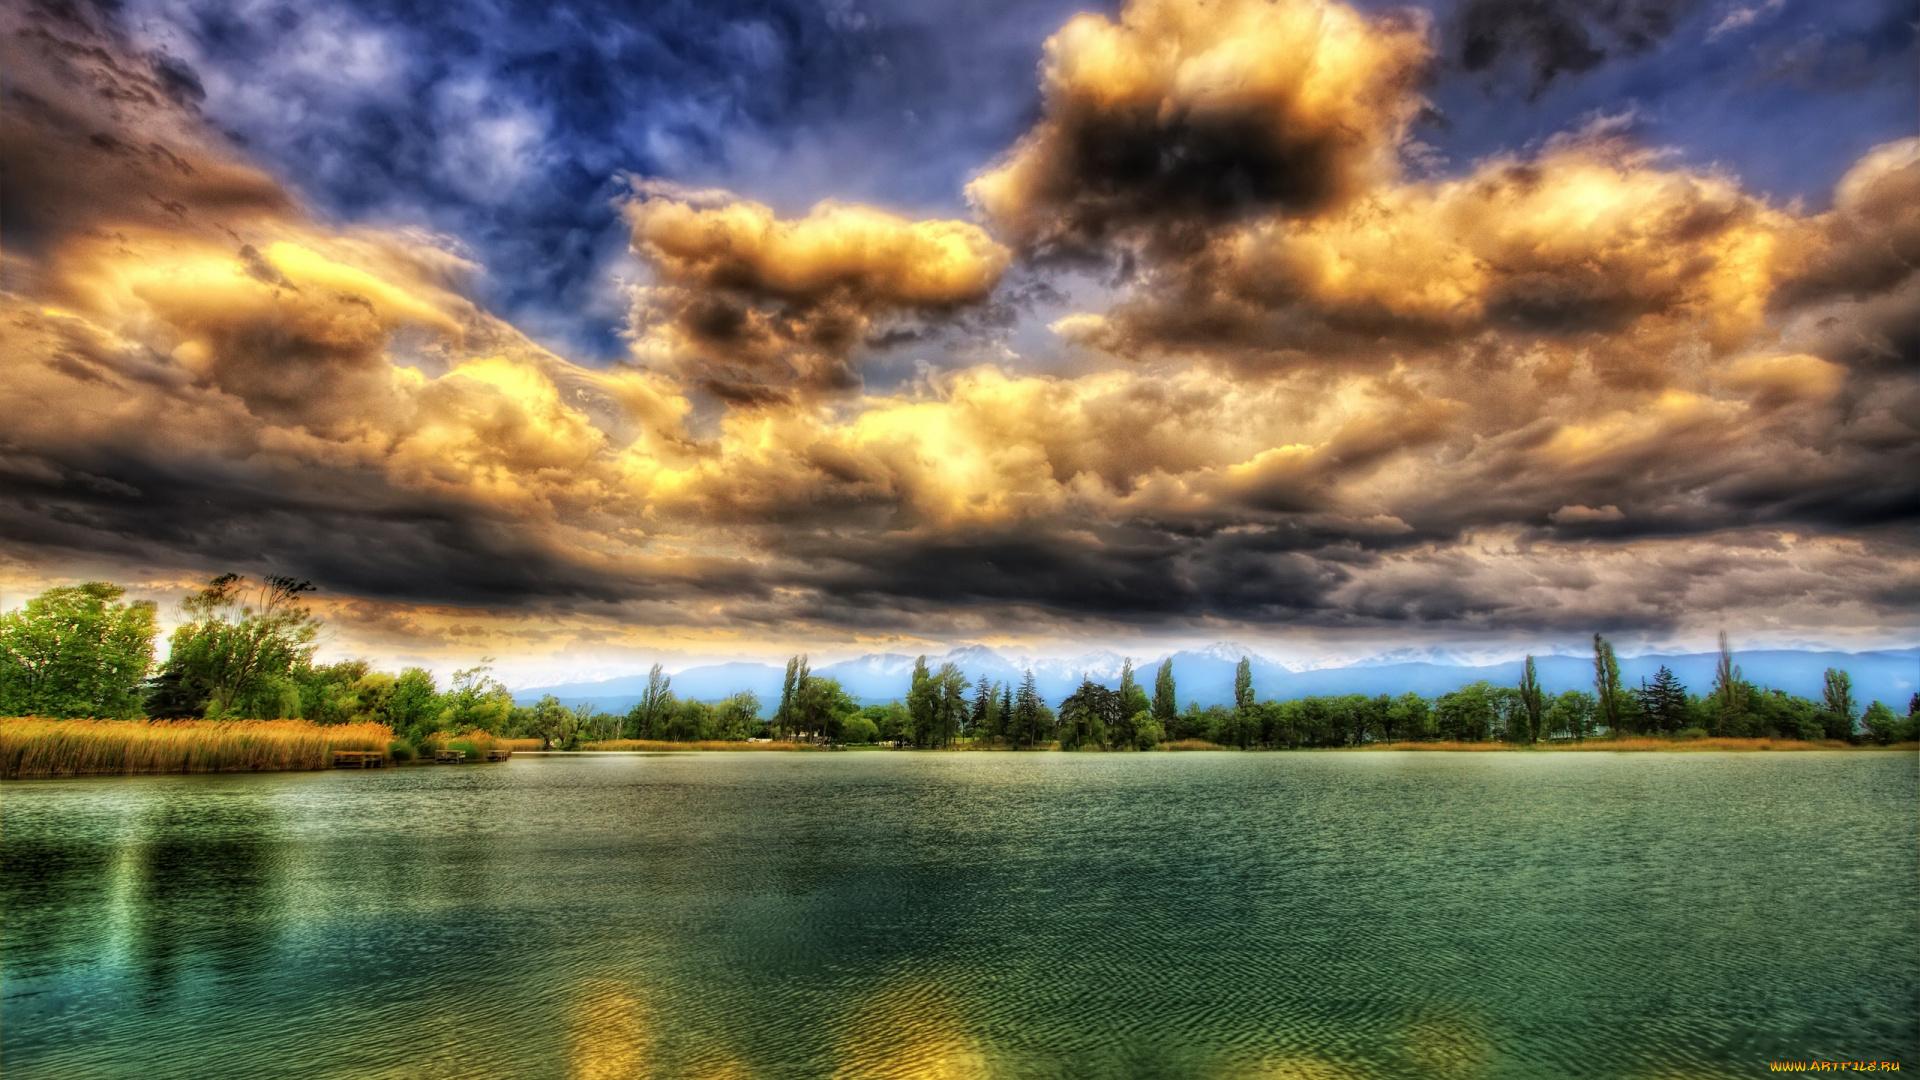 озеро облака проторы на телефон